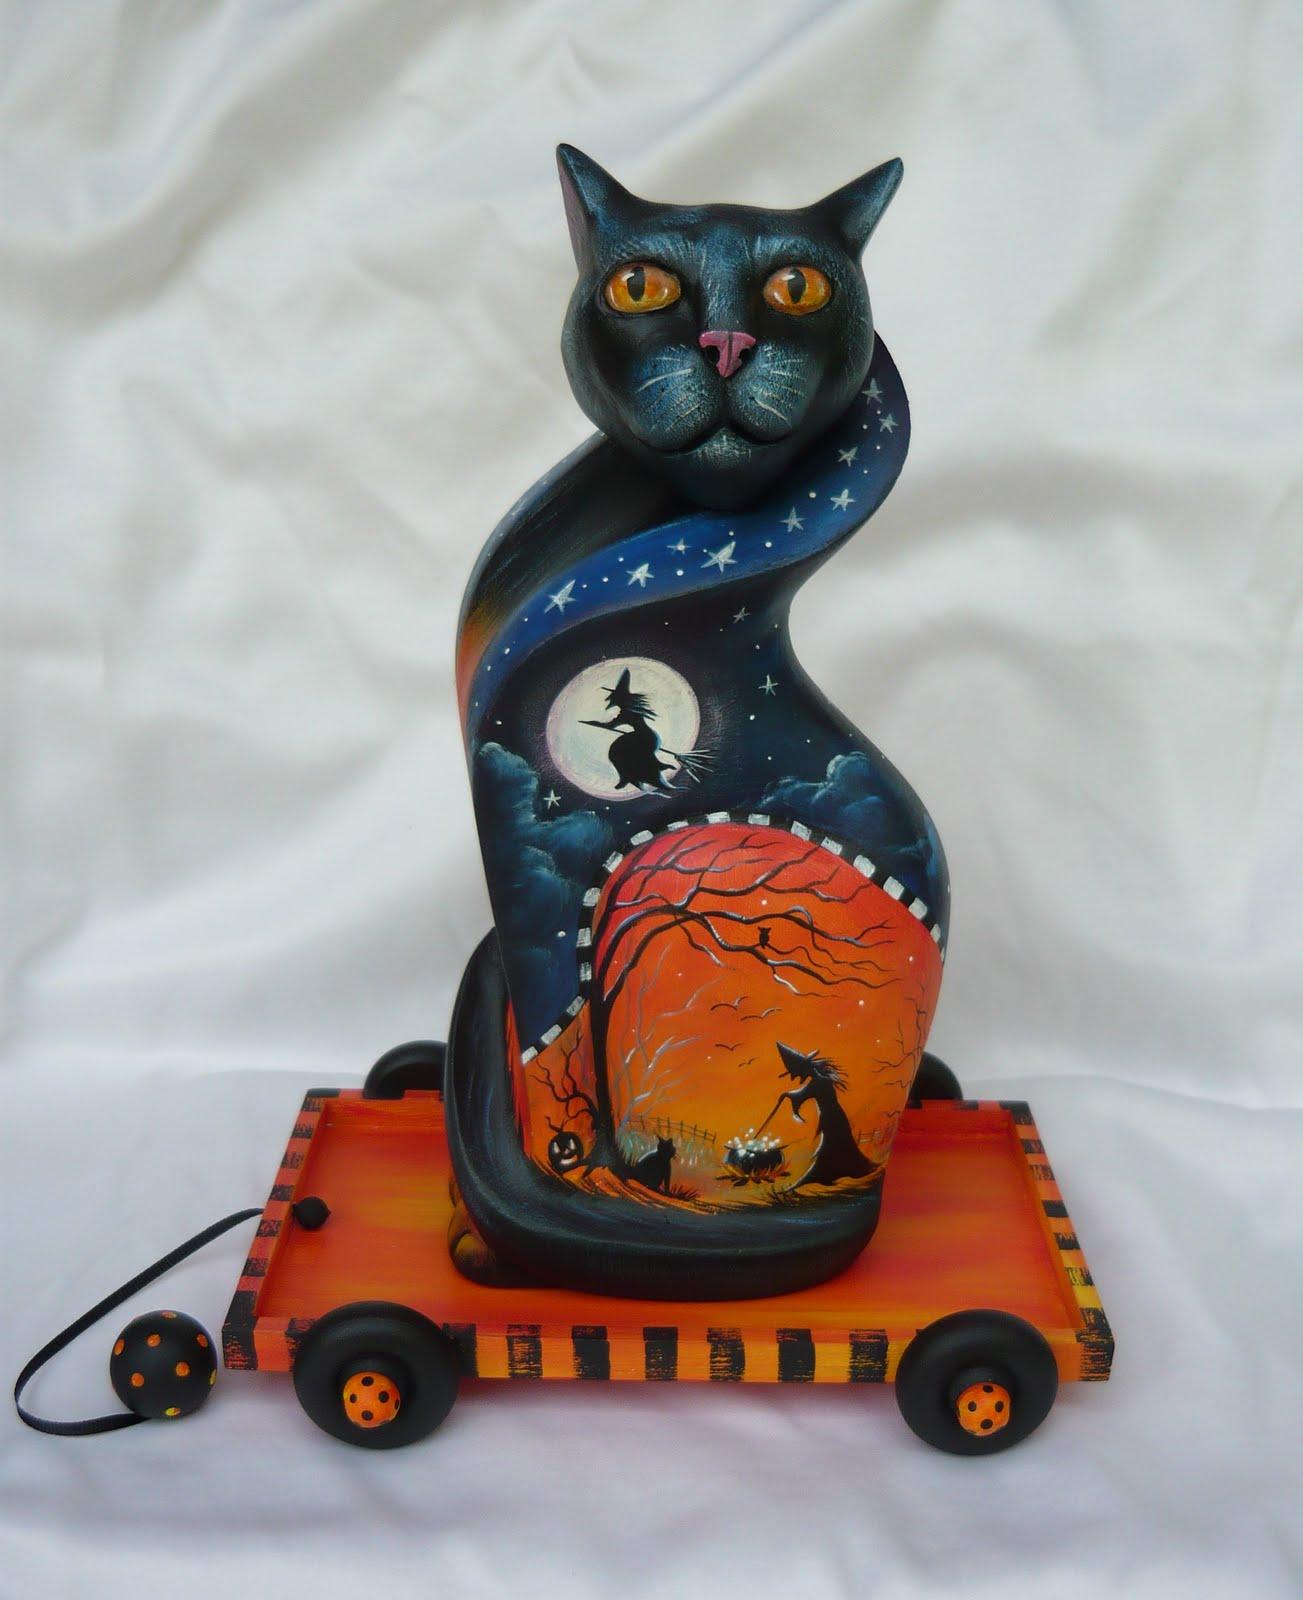 Cat Pulling Wagon : Magic brush studio halloween carved cat in pull cart on